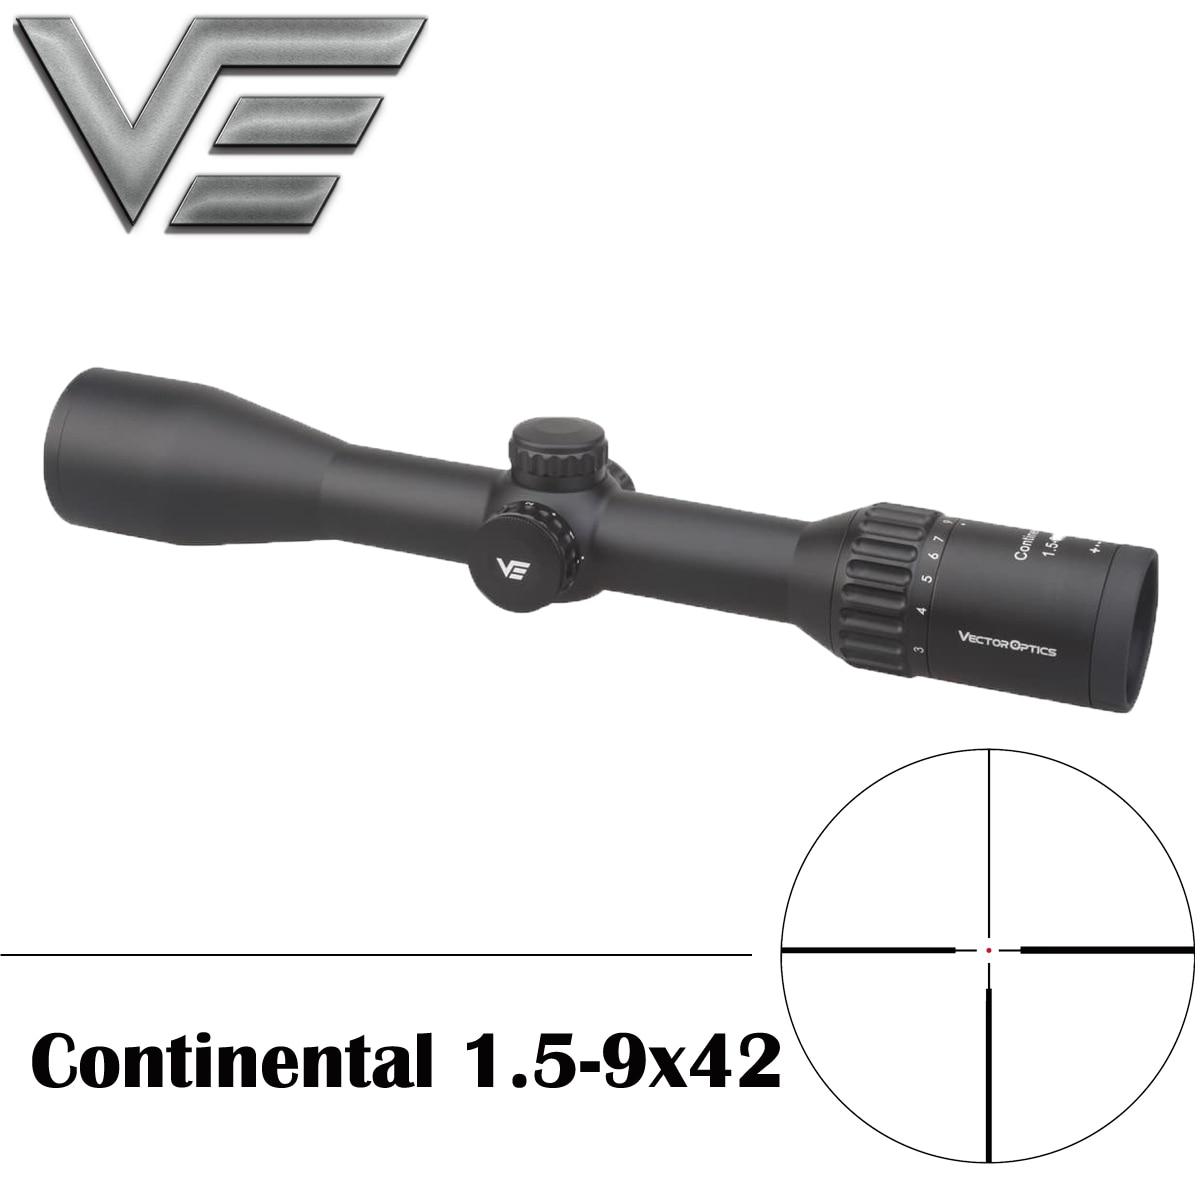 Vector Optics Continental 1 5 9x42 Riflescope Clear View Hunting Rifle Scope Illuminated Dot Reticle German